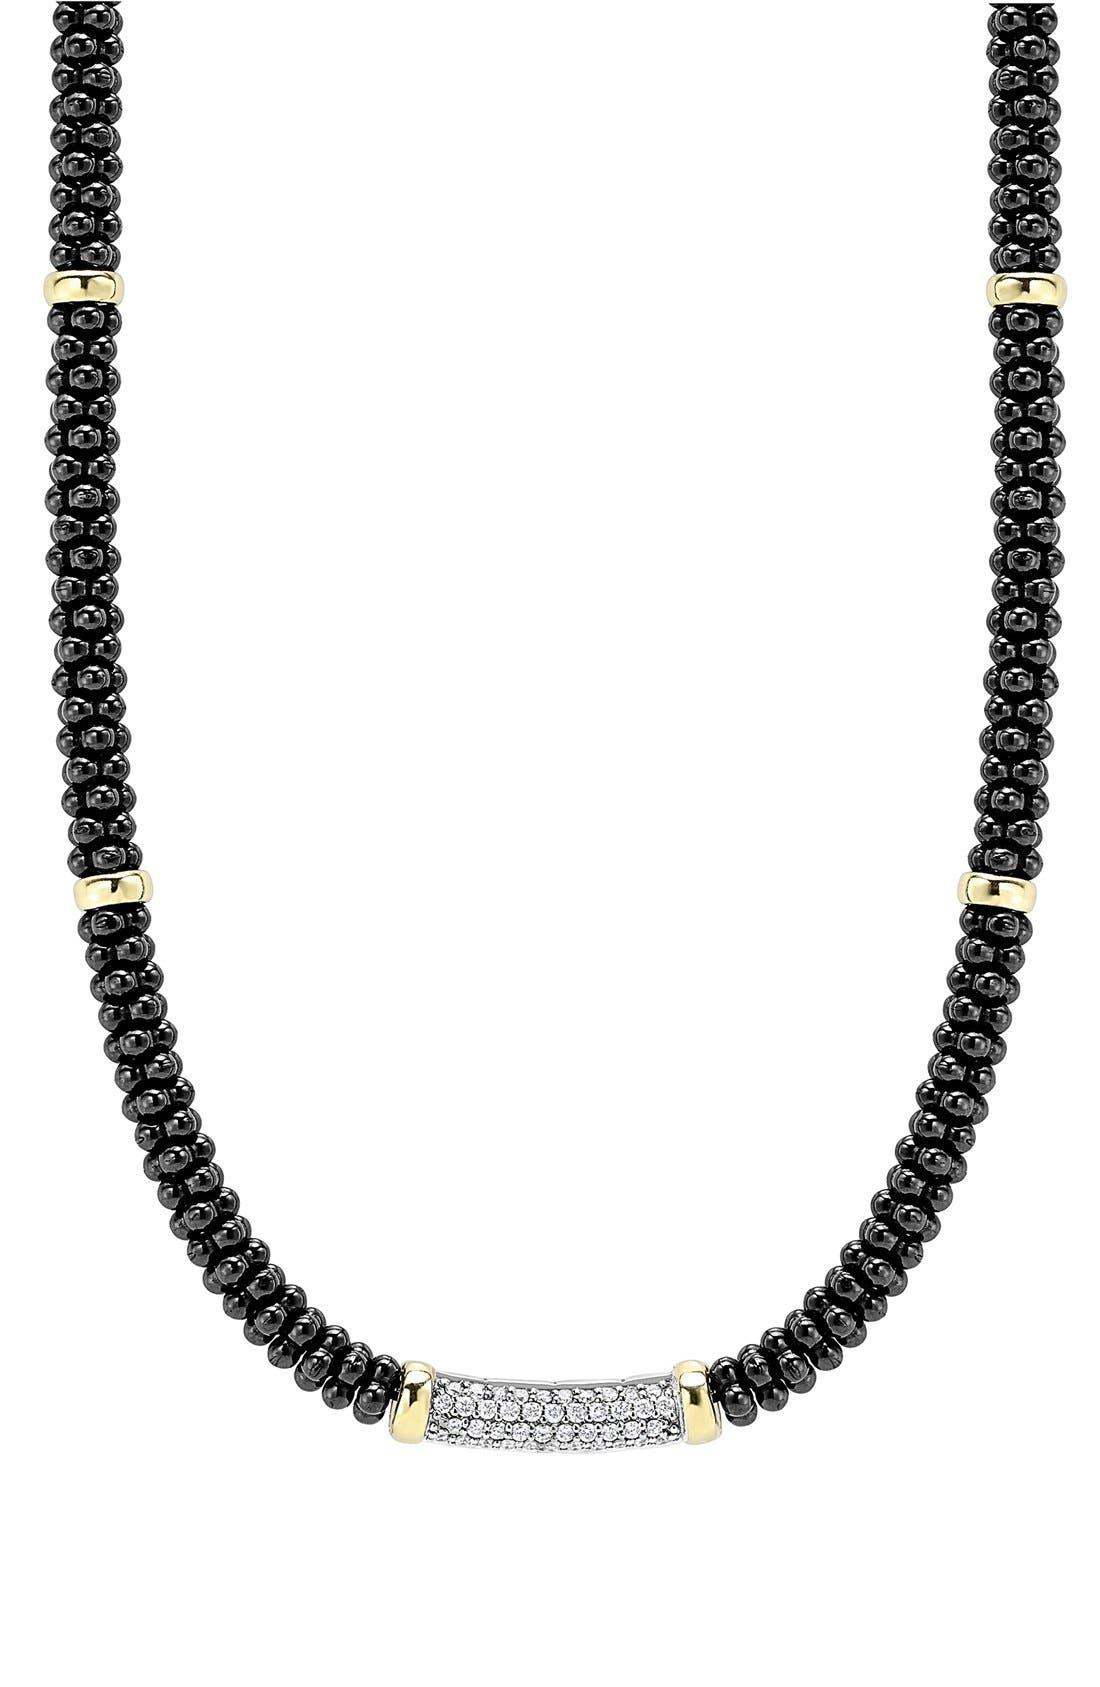 'Black Caviar' 5mm Beaded DiamondBar Necklace,                         Main,                         color, Black Caviar/ Gold